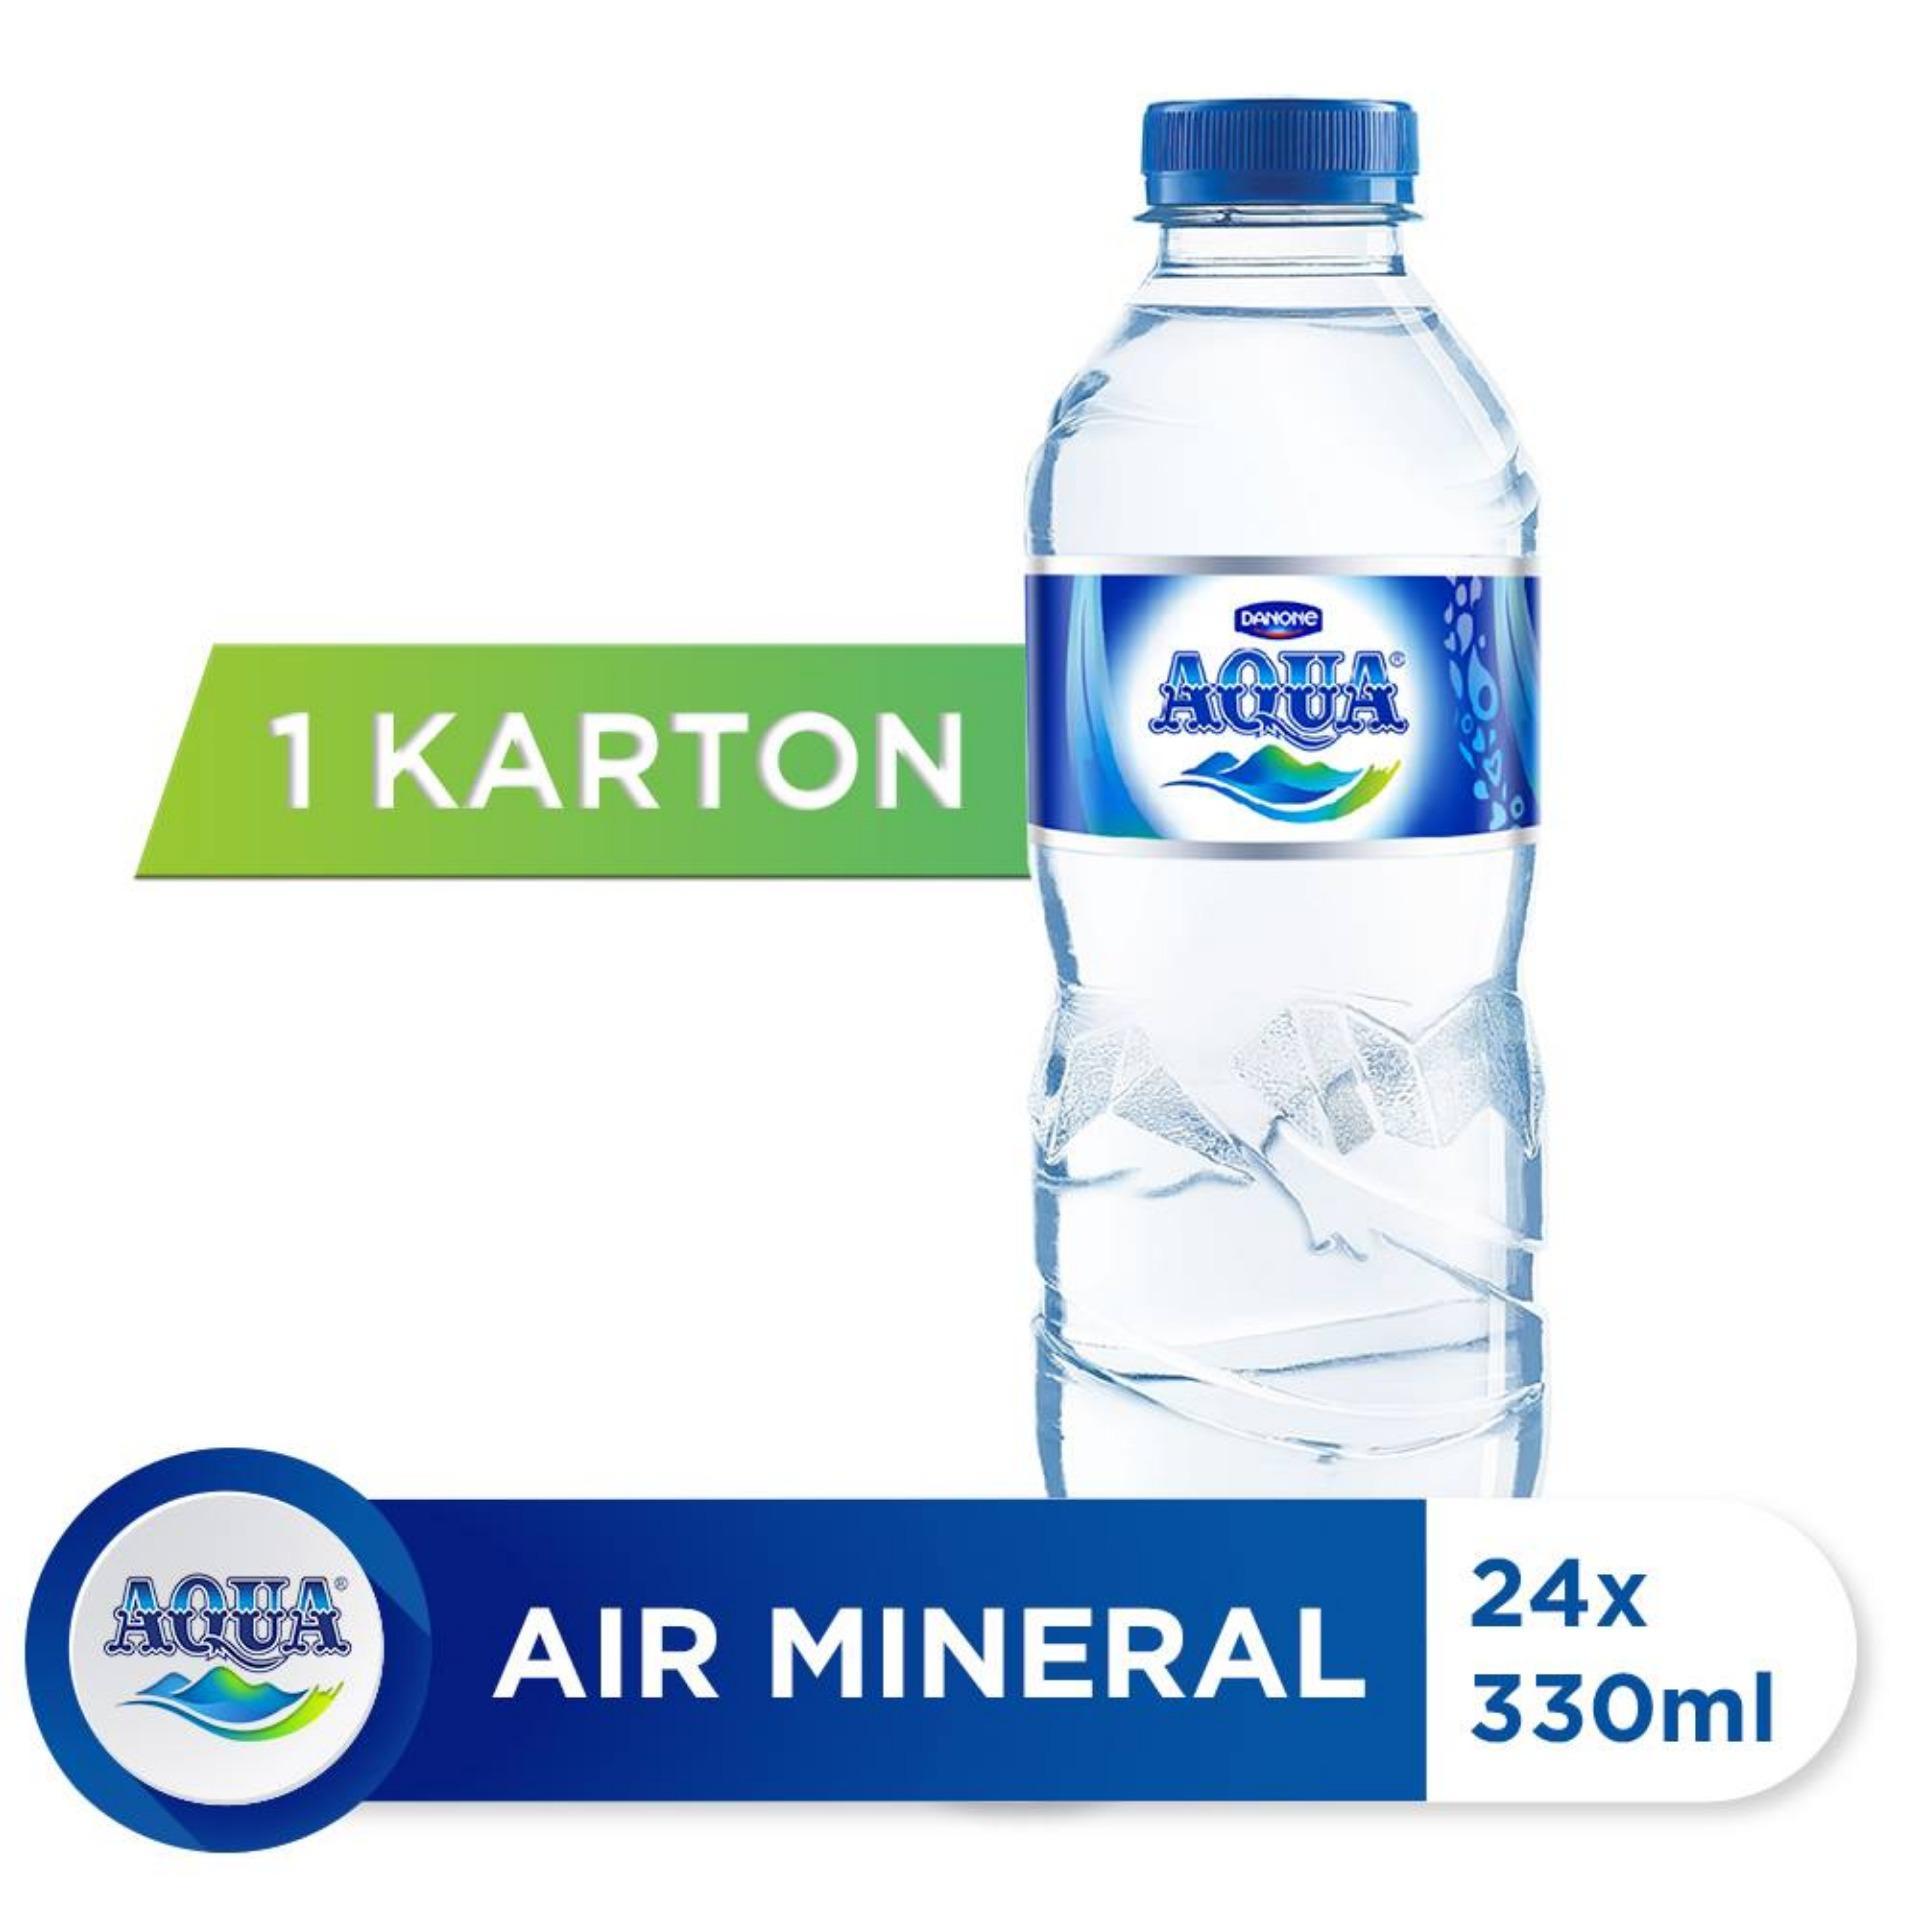 Aqua Air Mineral 330ml (24 Botol) By Danone Waters.